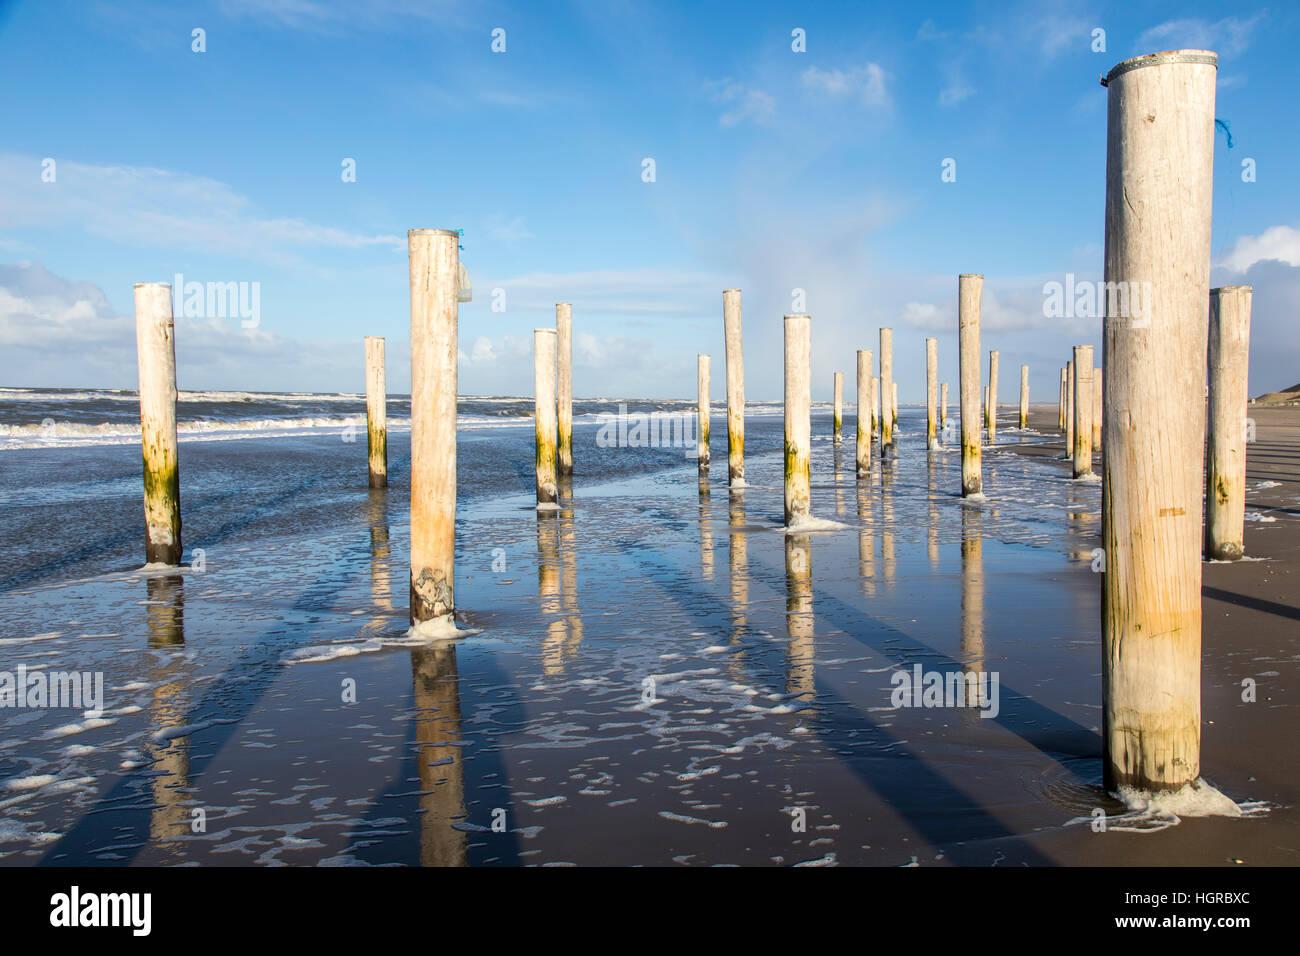 "artwork, art installation ""Petten in Palen' on the northern coast of Petten, North Holland, 160 wooden piles, - Stock Image"